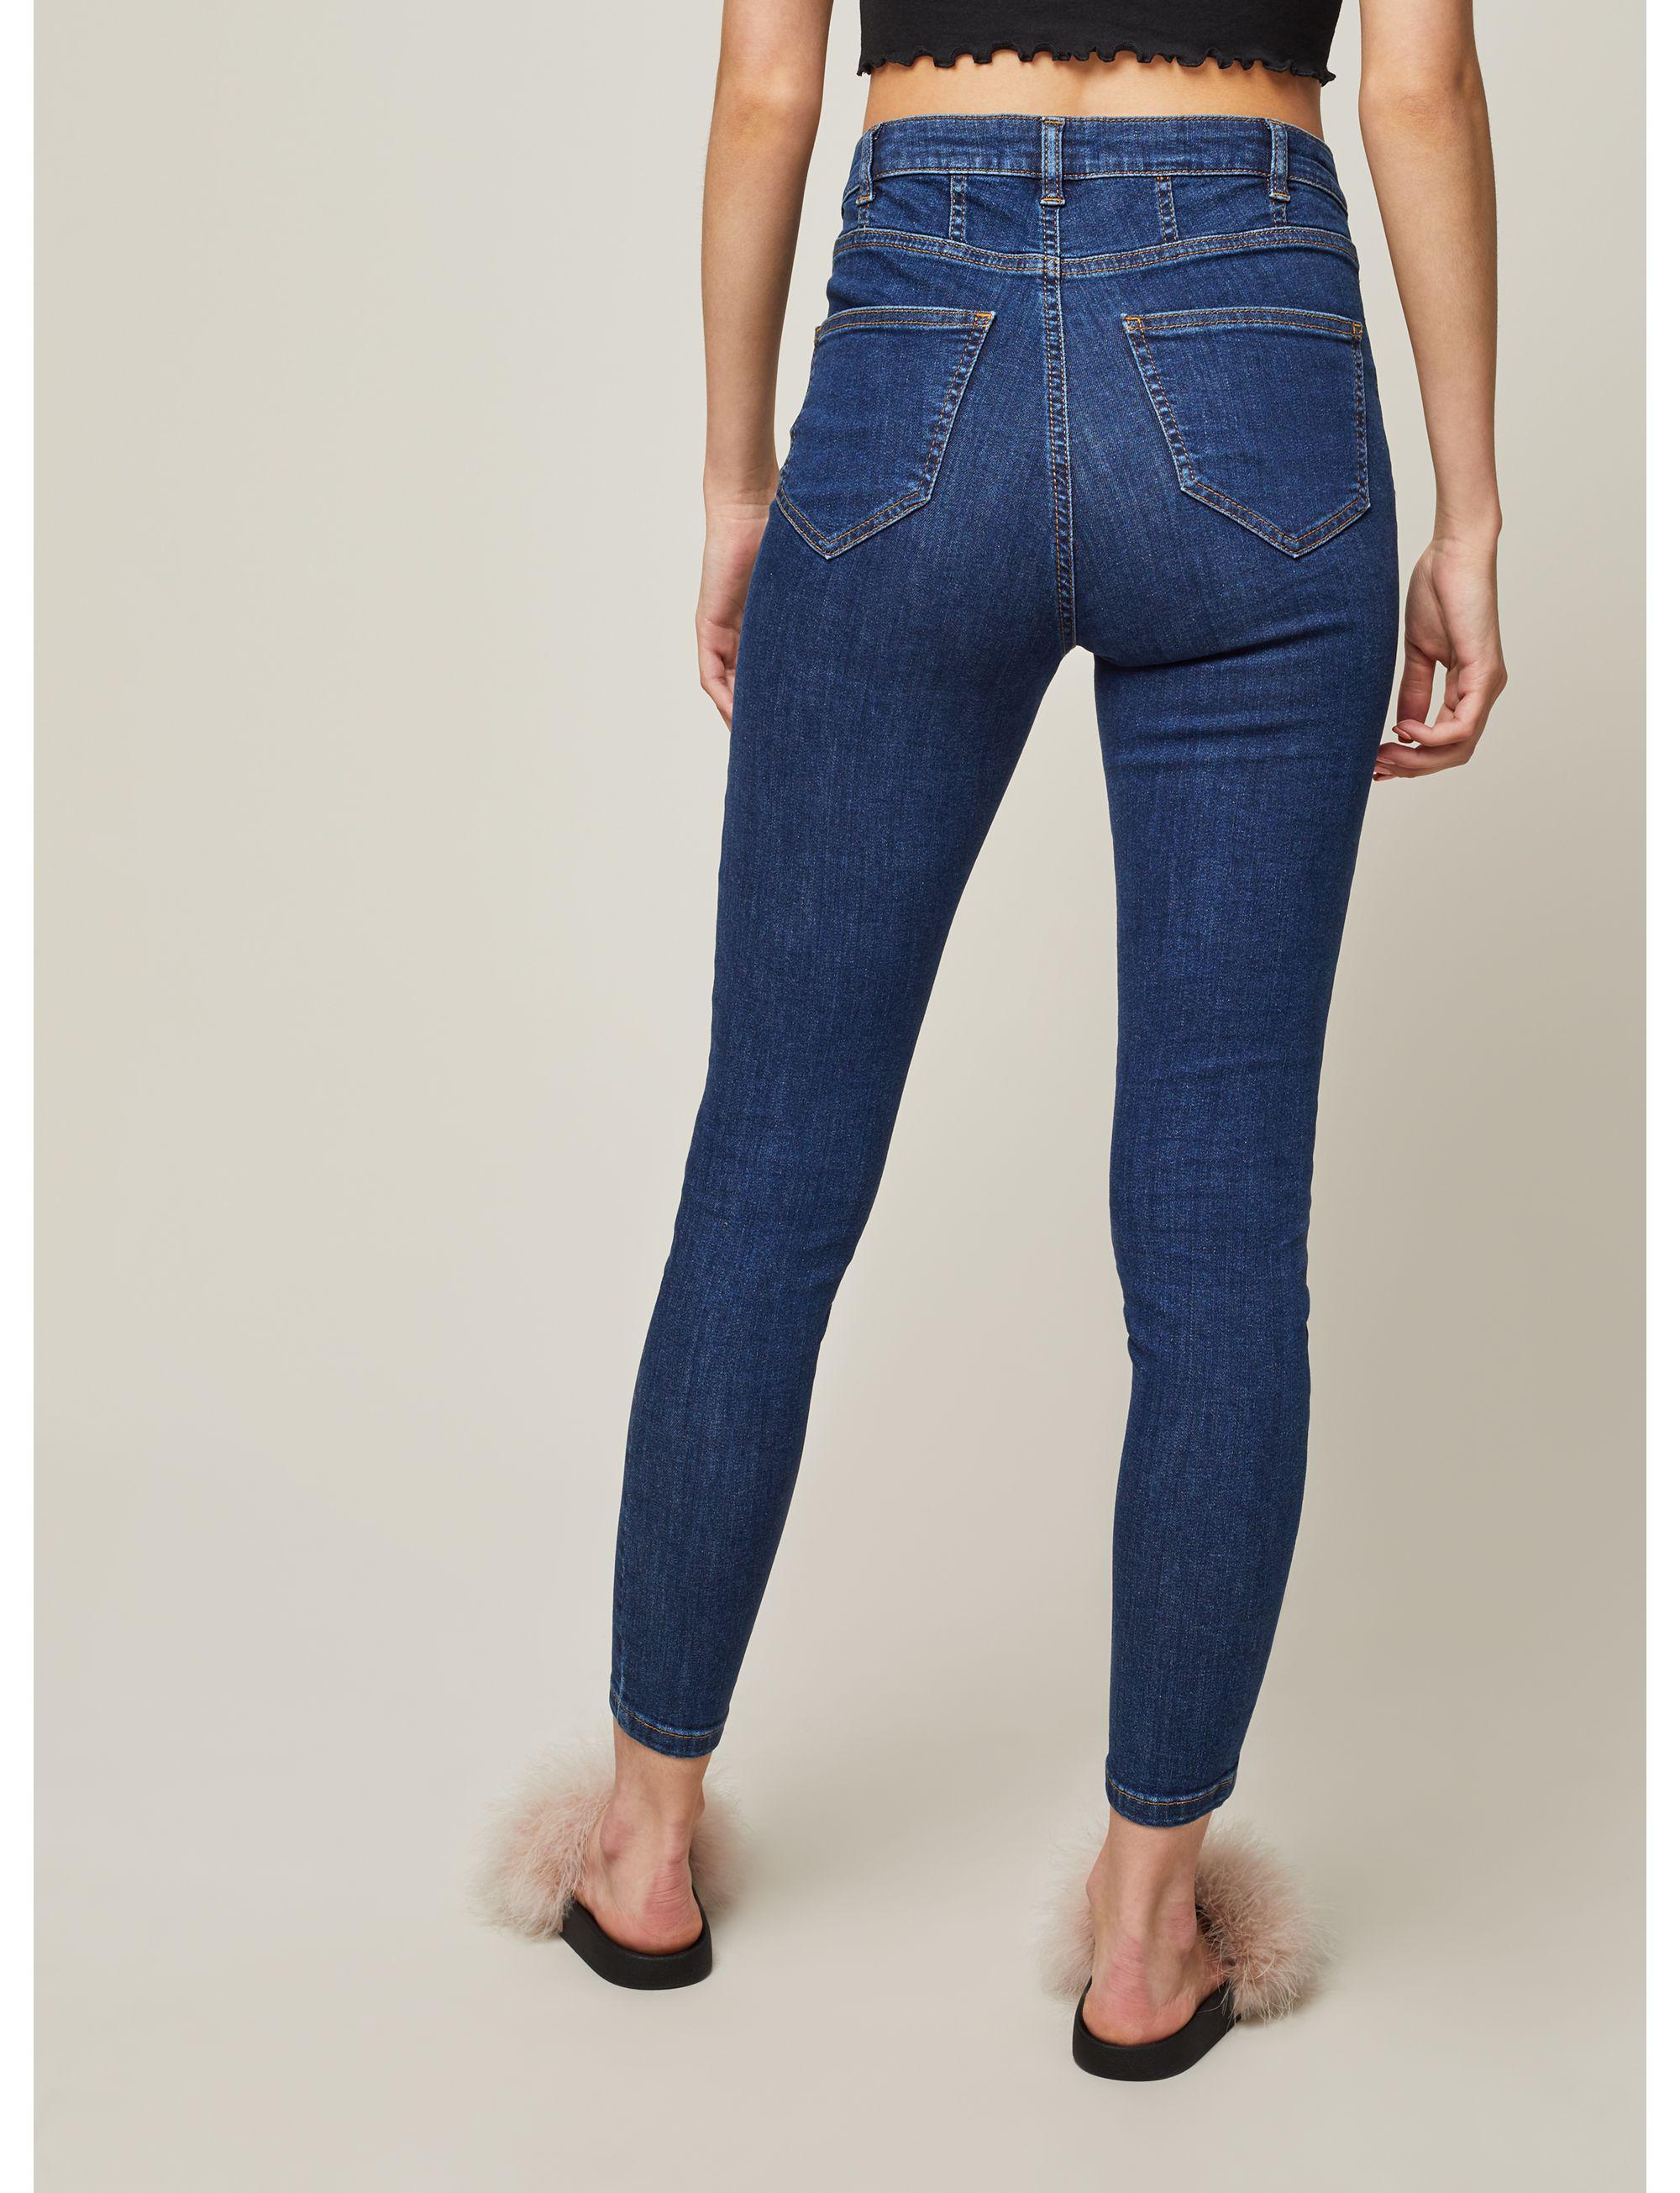 Miss Selfridge Denim Lizzie High Waist Super Skinny Indigo Corset Jeans in Blue